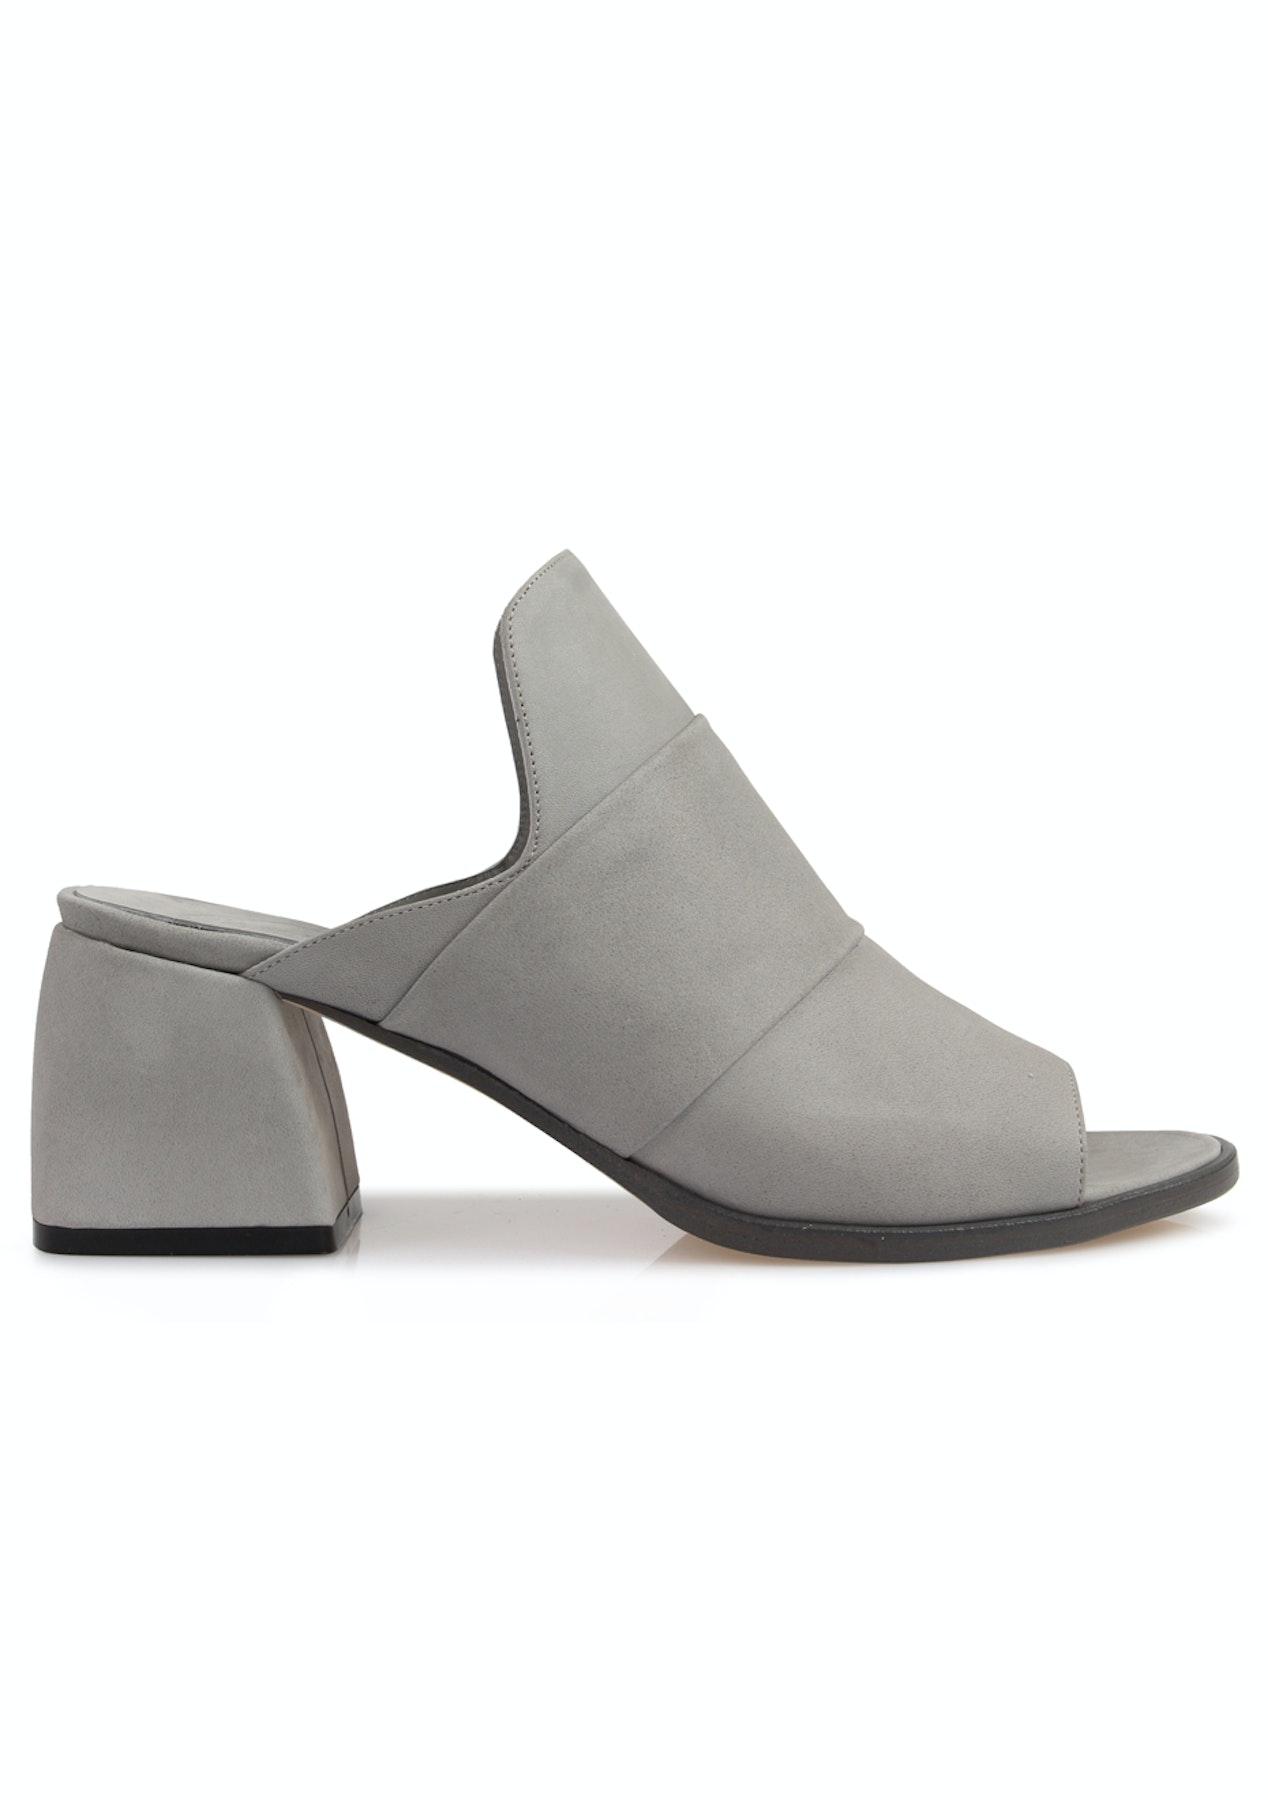 Beau Coops Shoes Sale